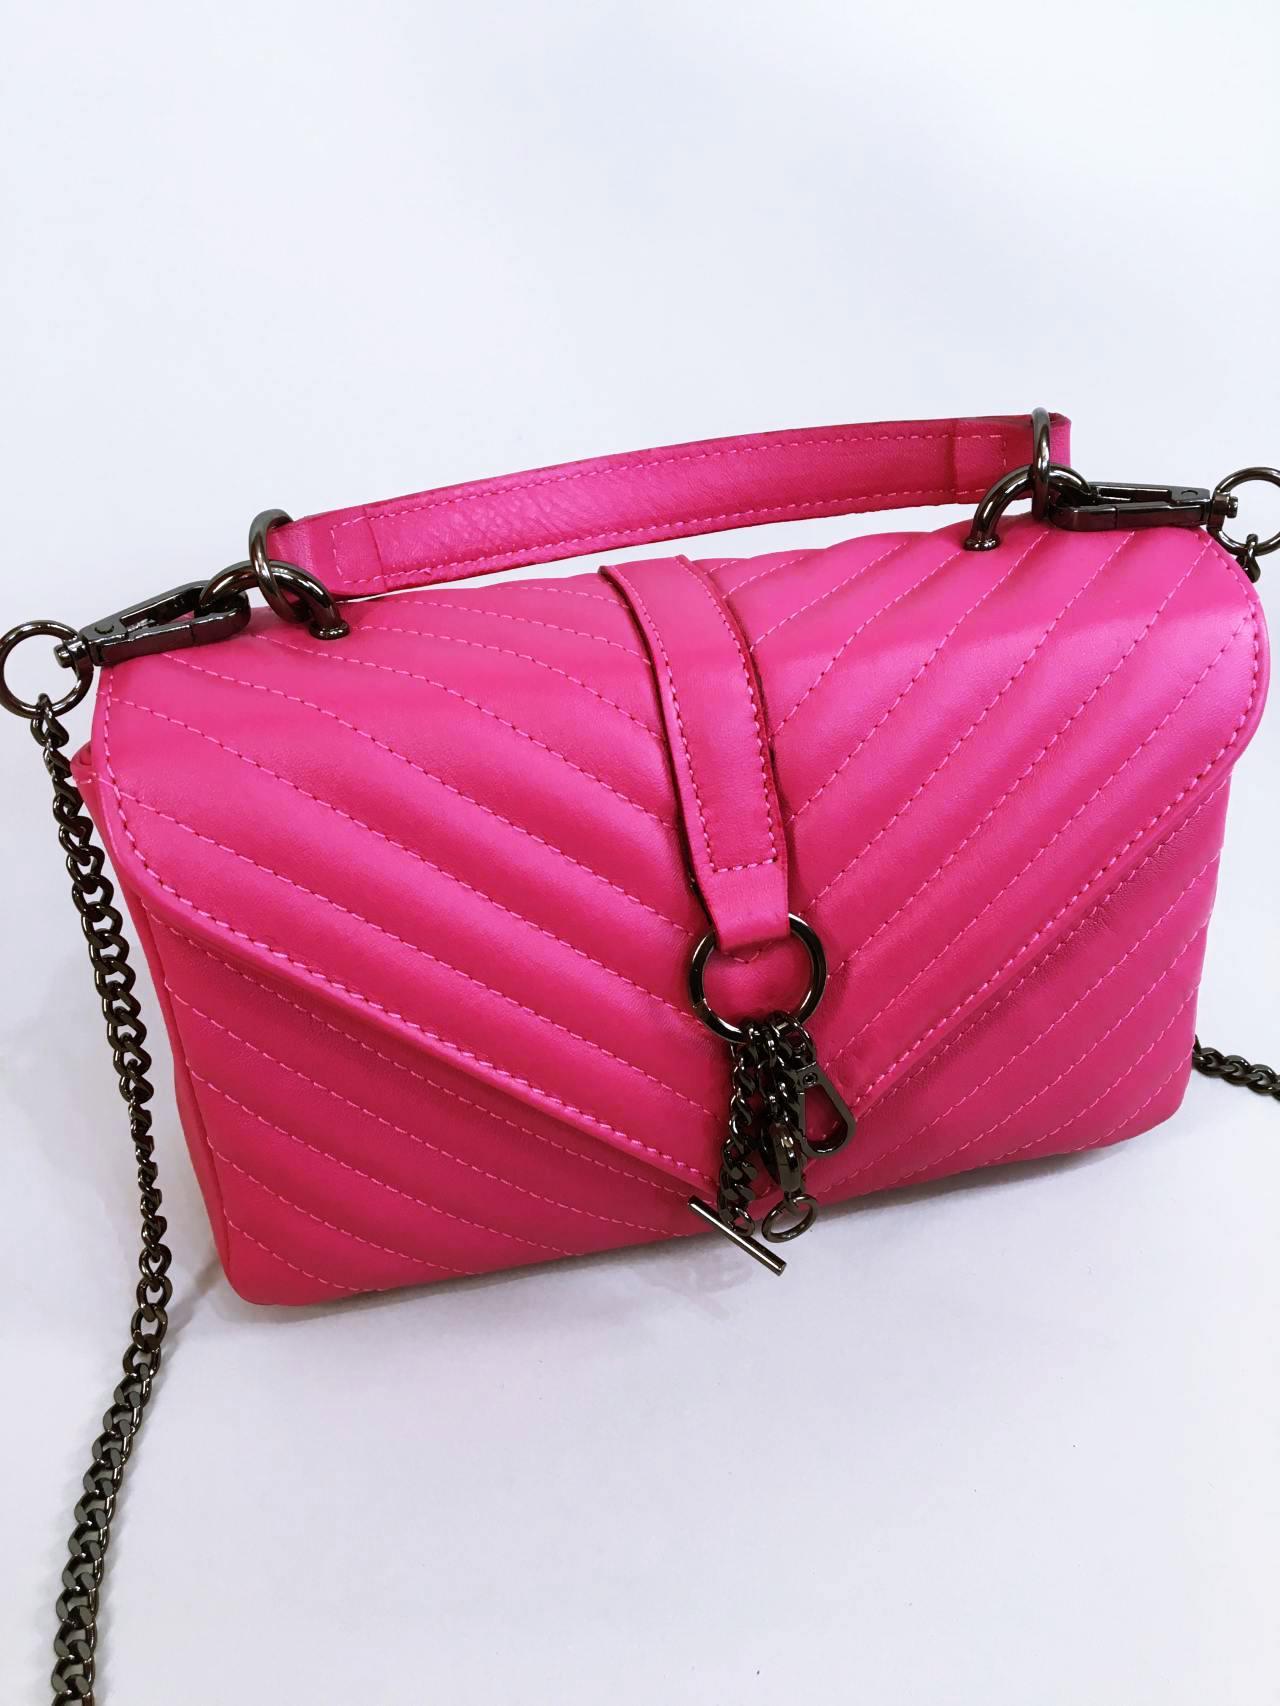 Kožená kabelka Lilly růžová – Simm-Fashion.cz d40e3bdfeb